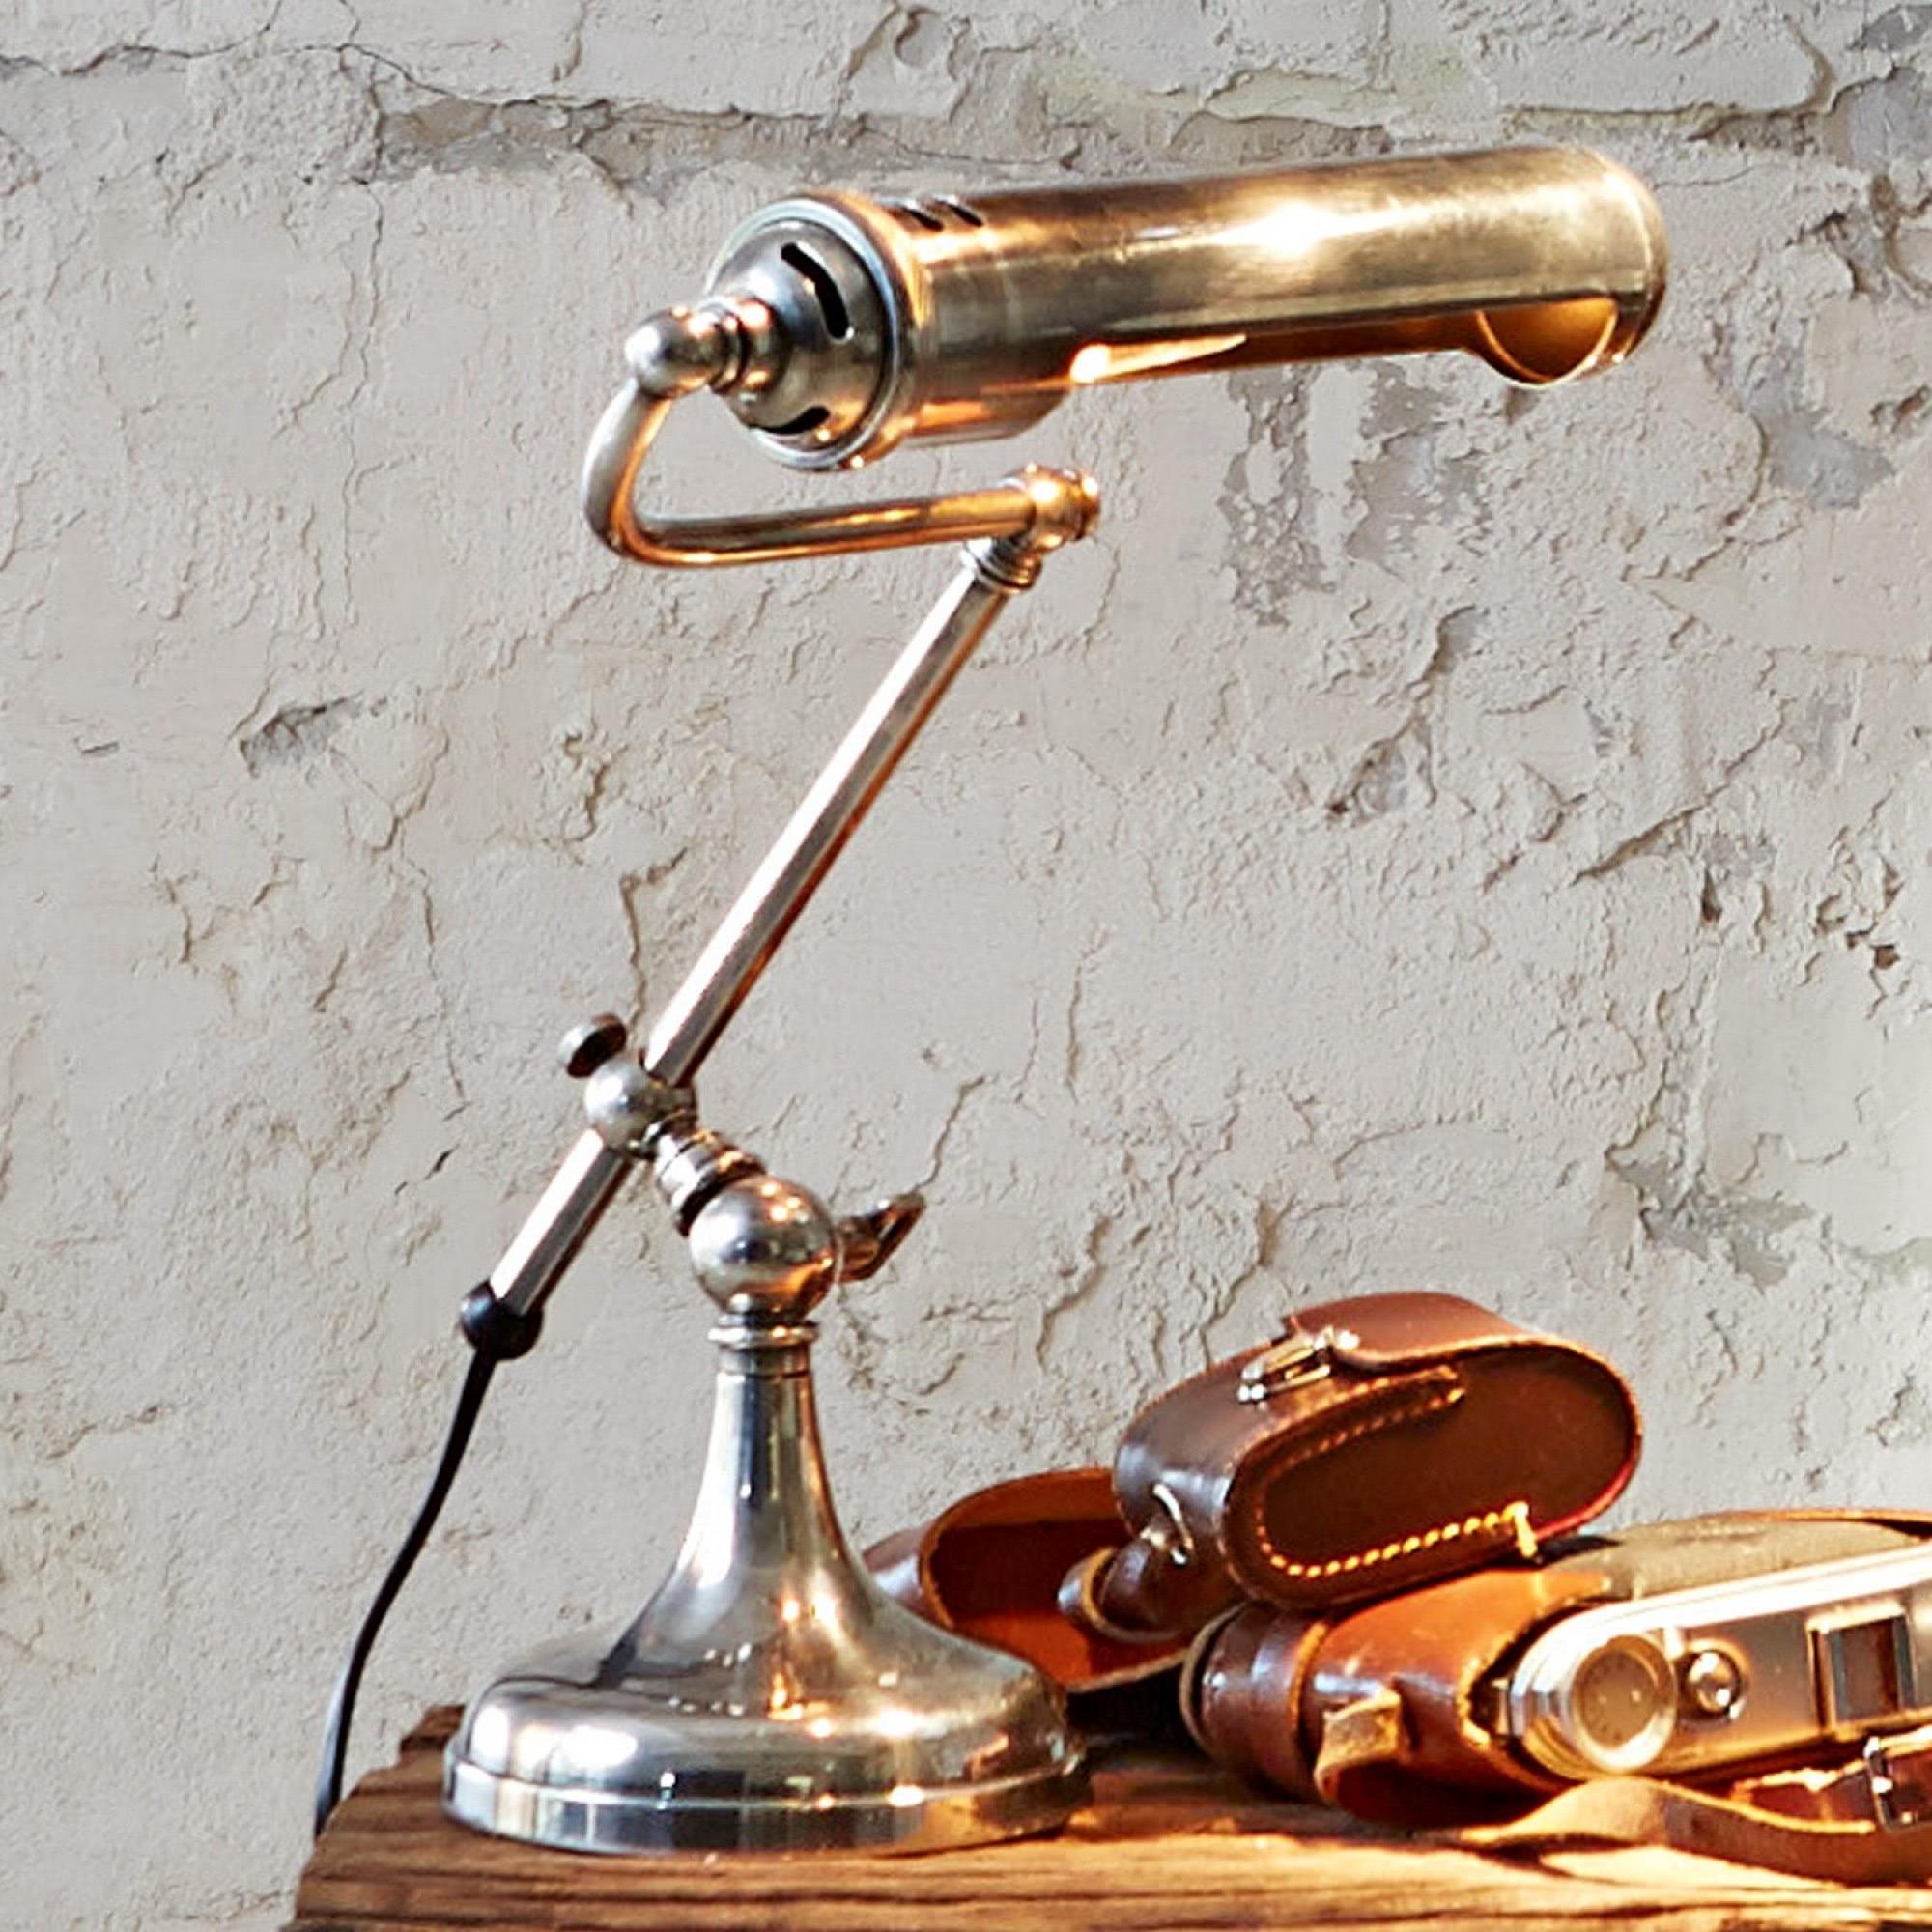 tischlampe pauley loberon coming home. Black Bedroom Furniture Sets. Home Design Ideas